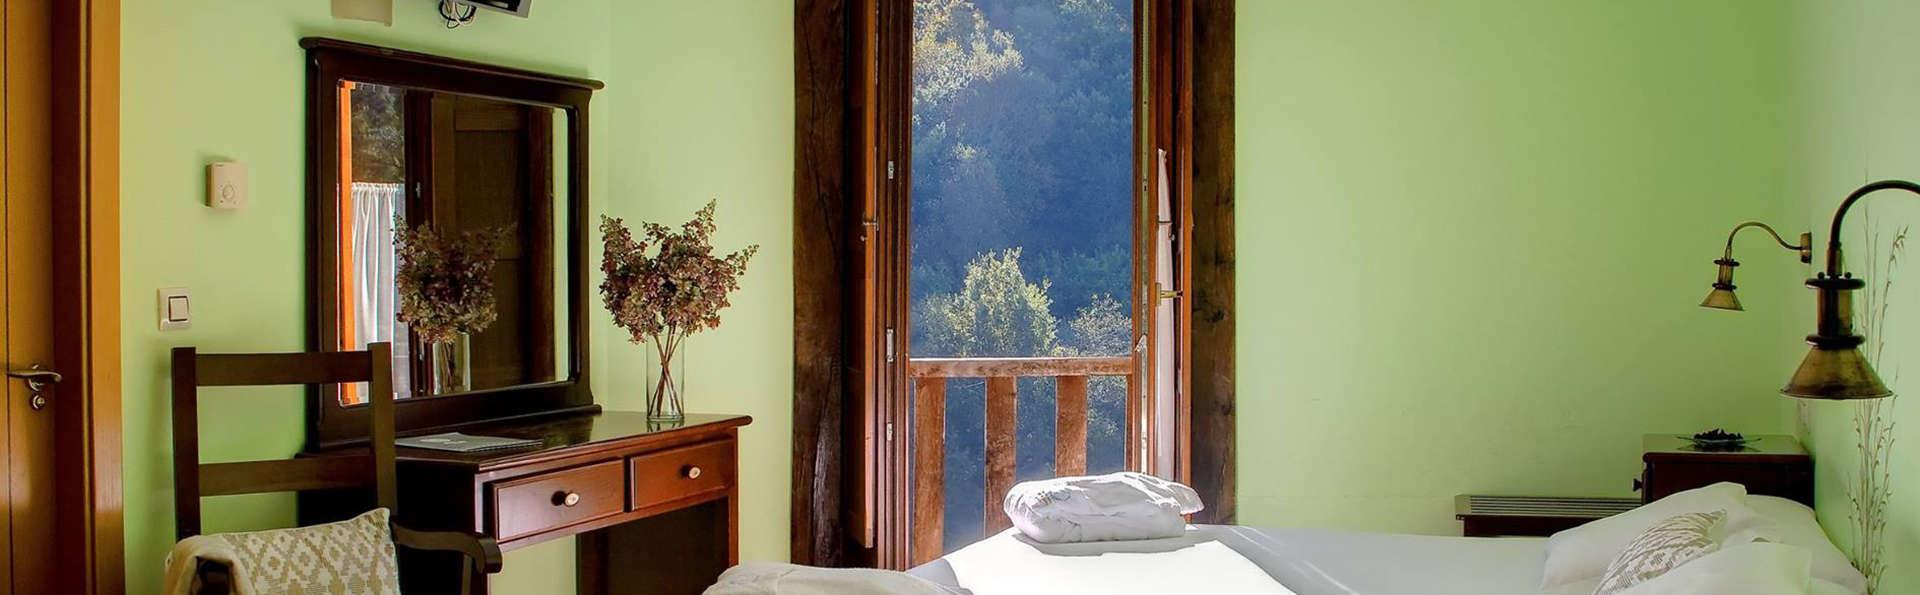 Hotel Balneario Oca Rio Pambre - edit_room03.jpg